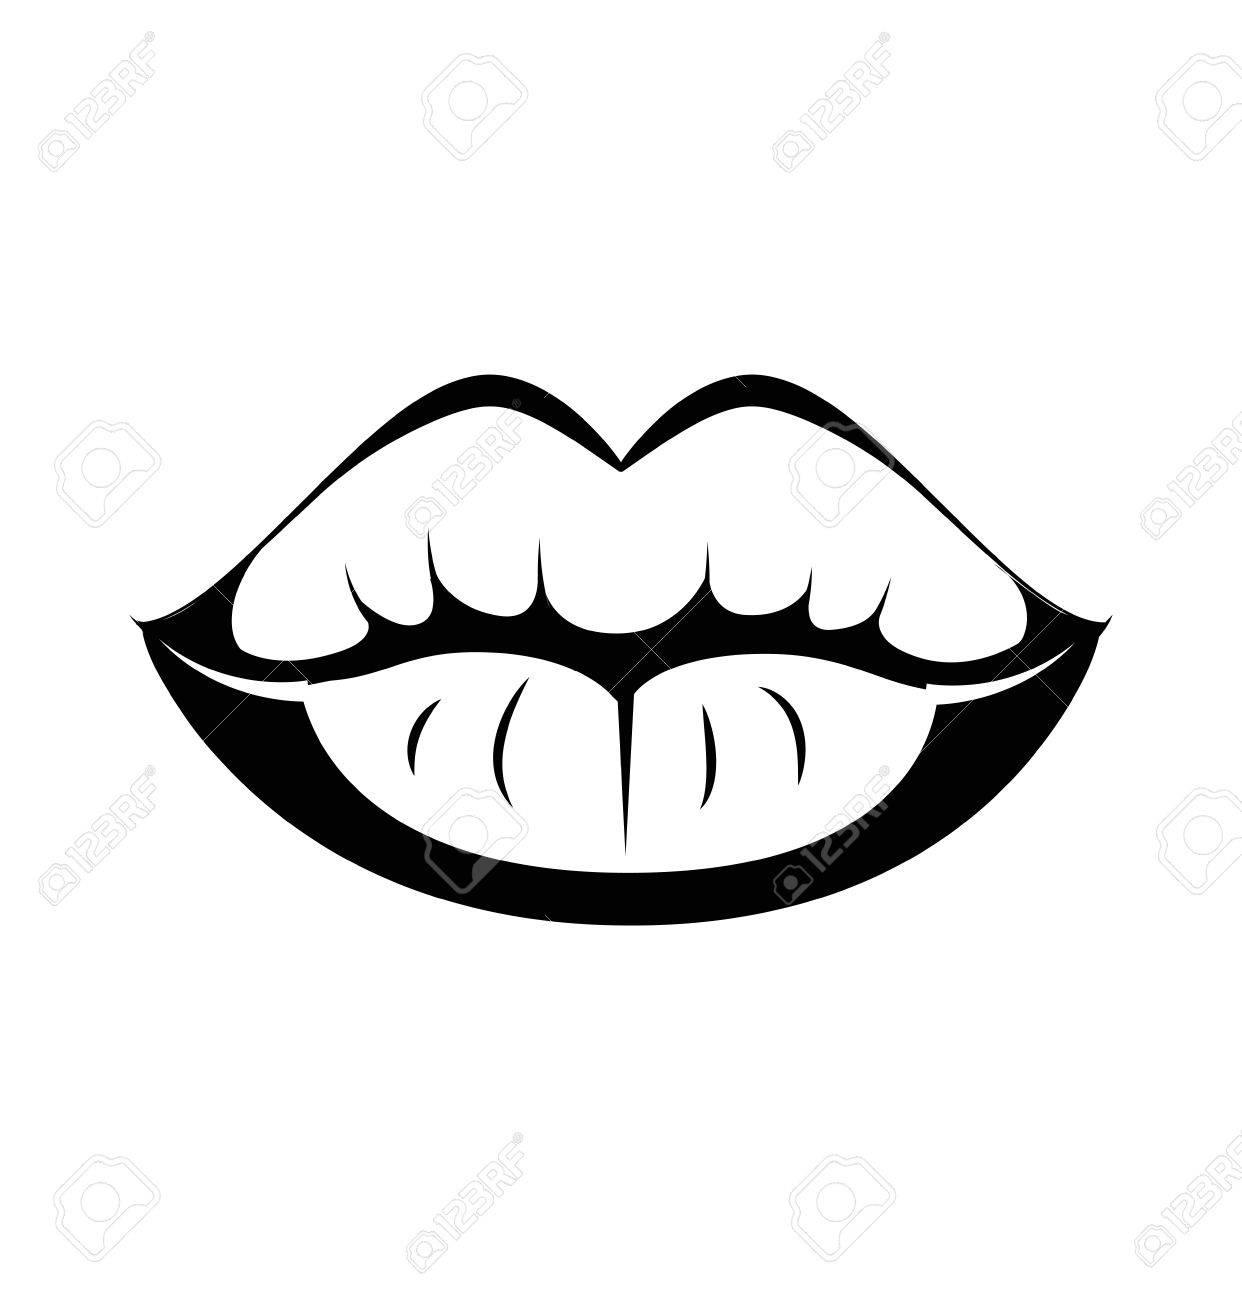 263 Kiss Lips free clipart.